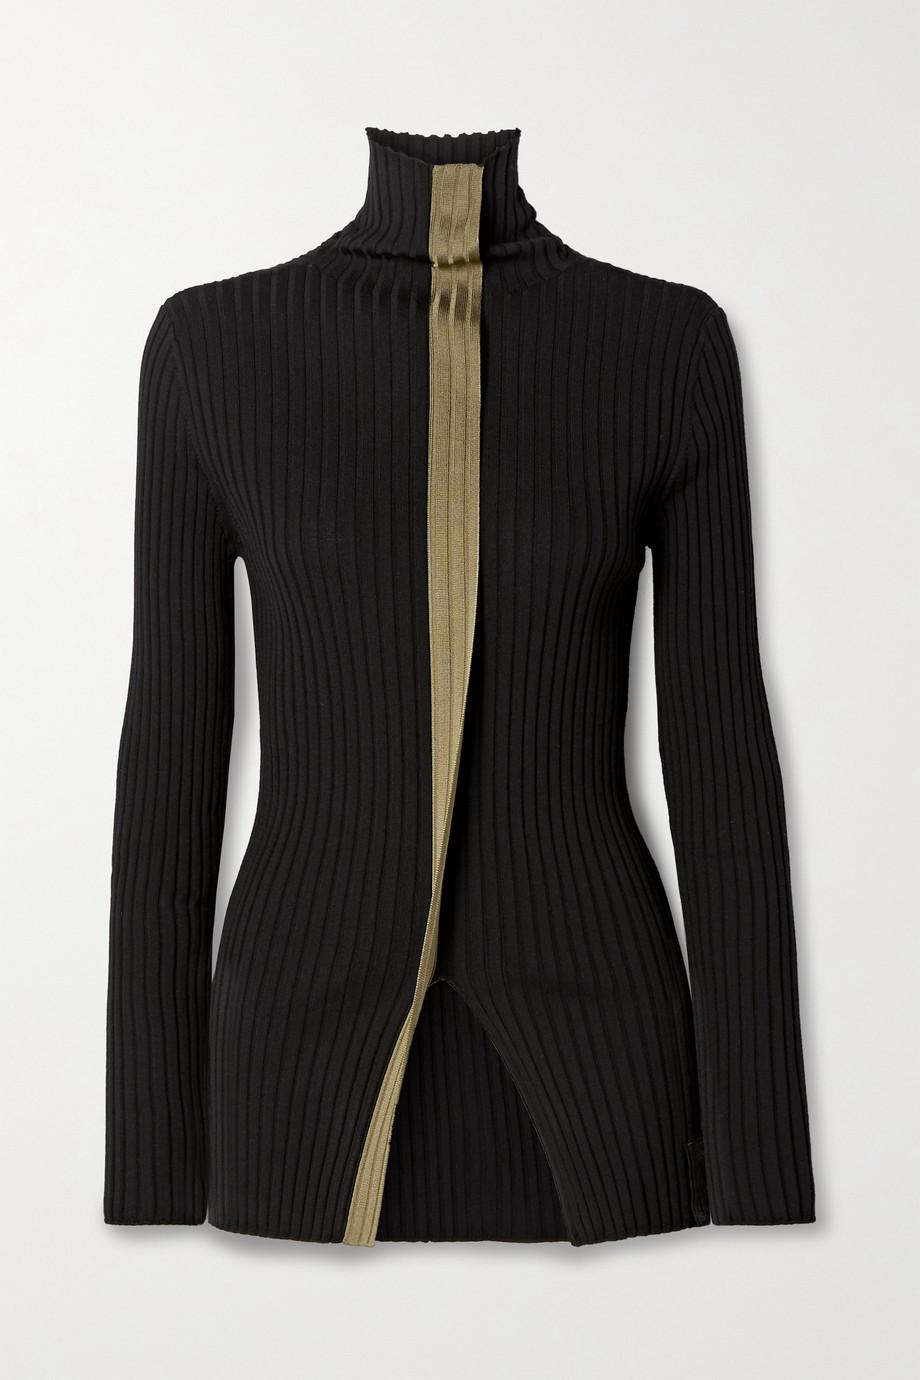 Moncler Genius + 2 Moncler 1952 two-tone ribbed wool turtleneck sweater